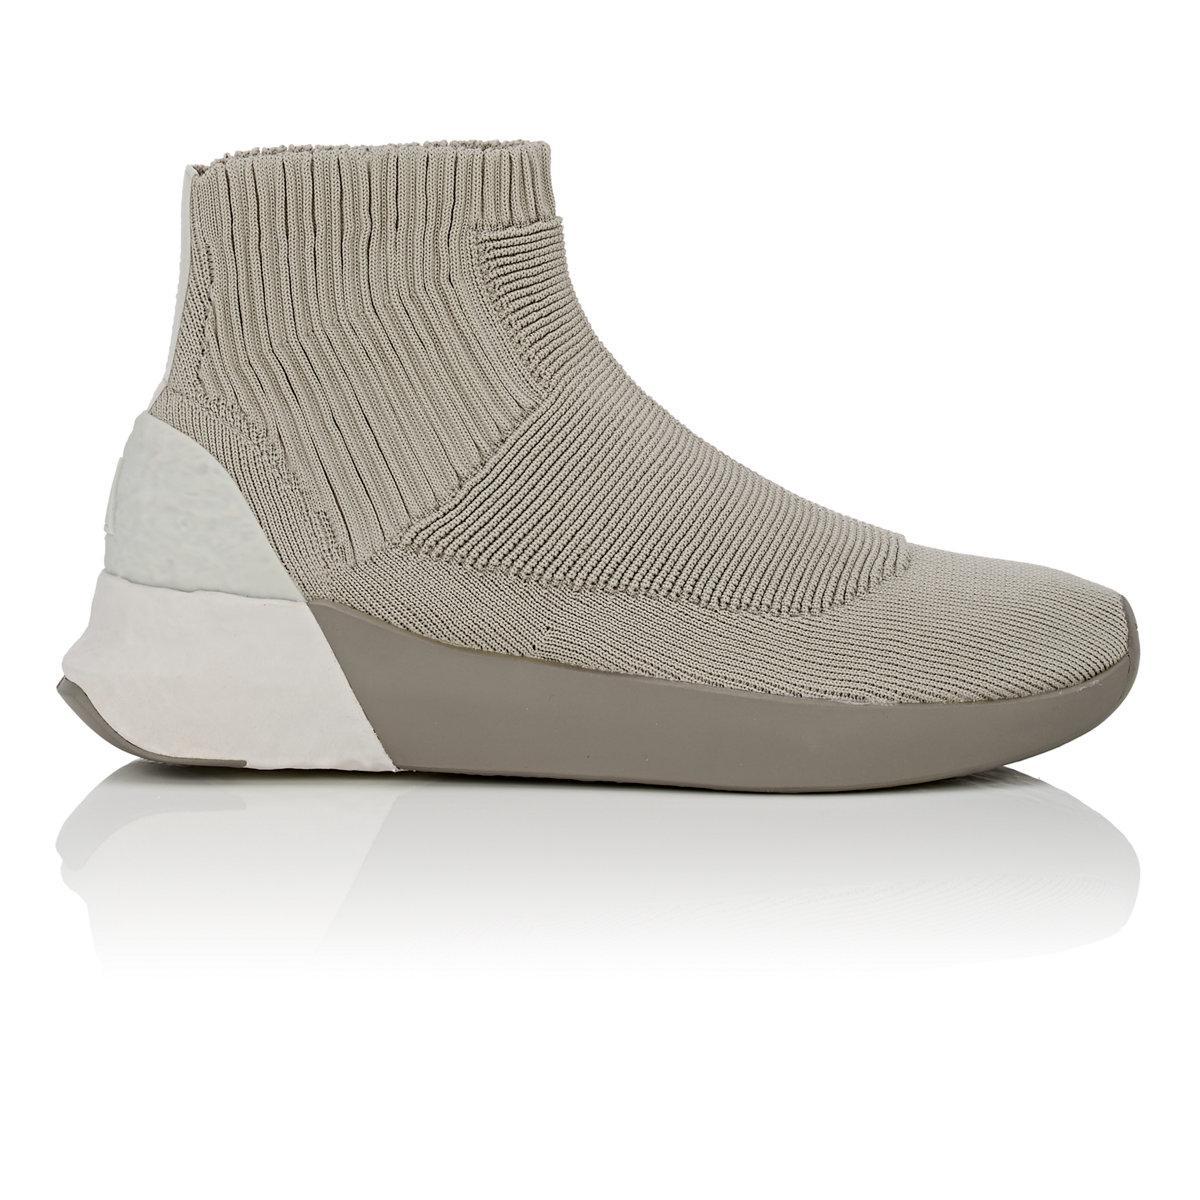 Mens Gama II Sock Sneakers Brandblack bdF5616Uz